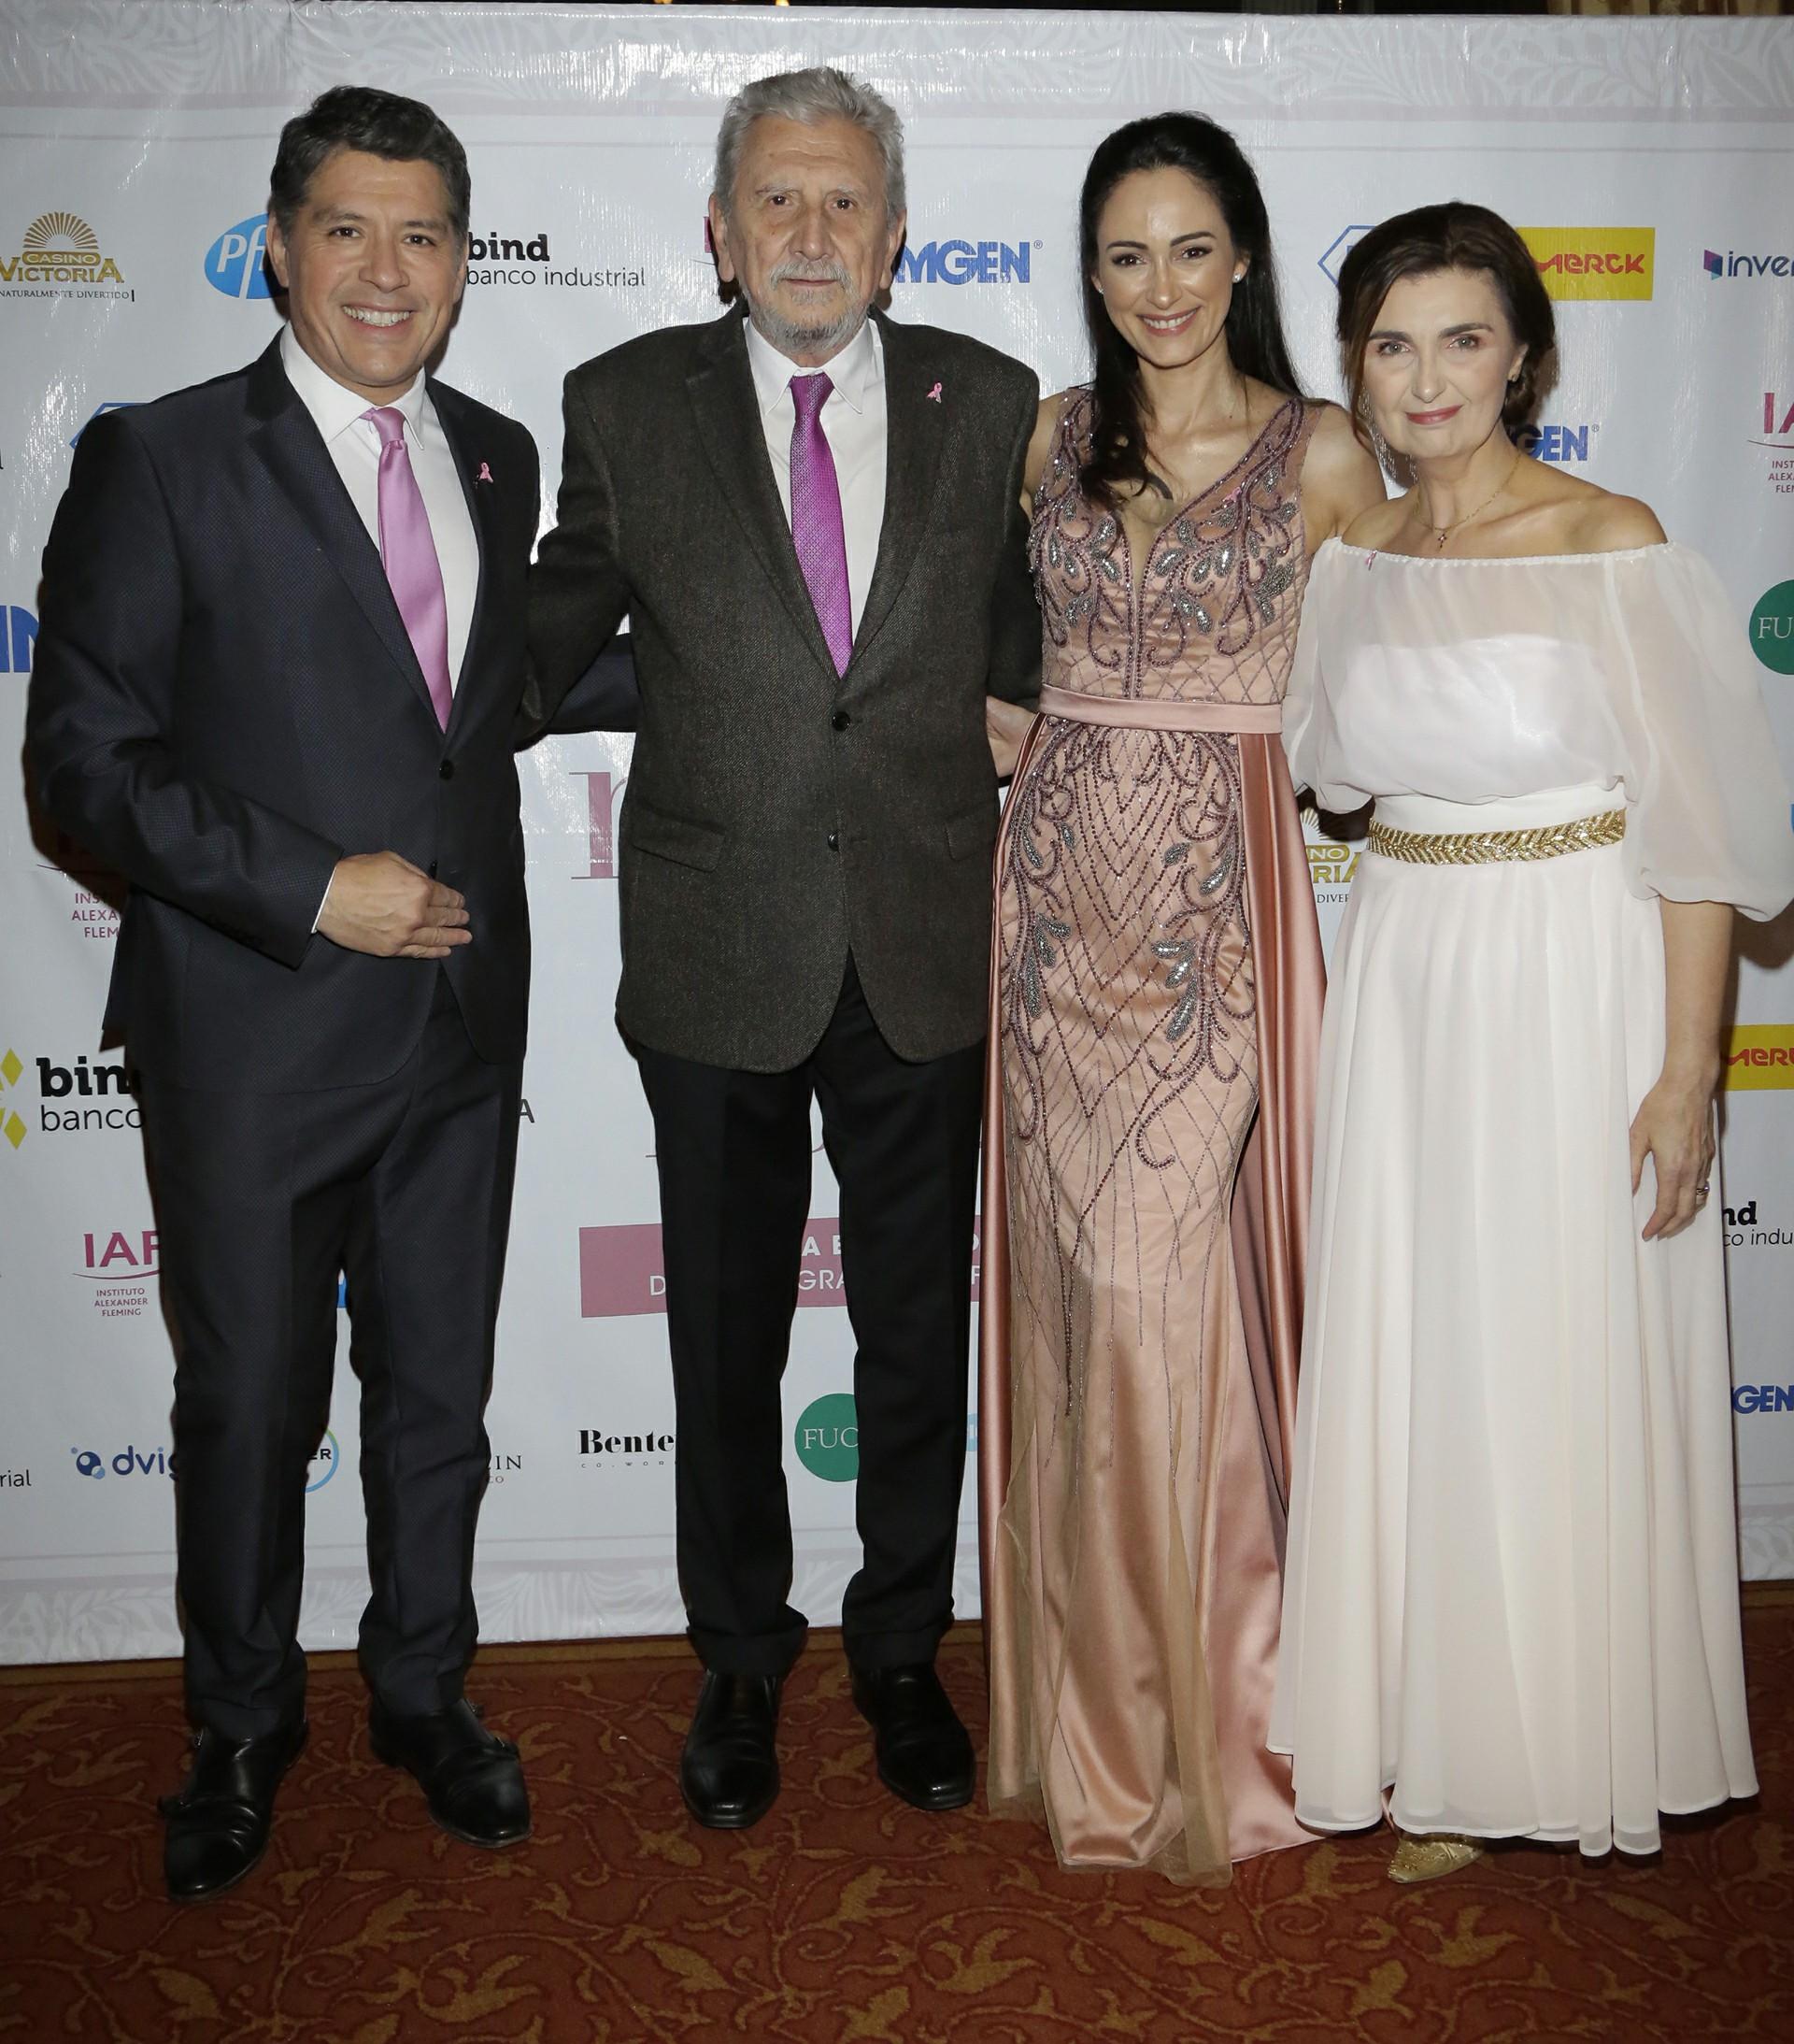 Guillermo Lobo, Reinaldo Chacón Gabriela Sobrado y Gabriela Berta